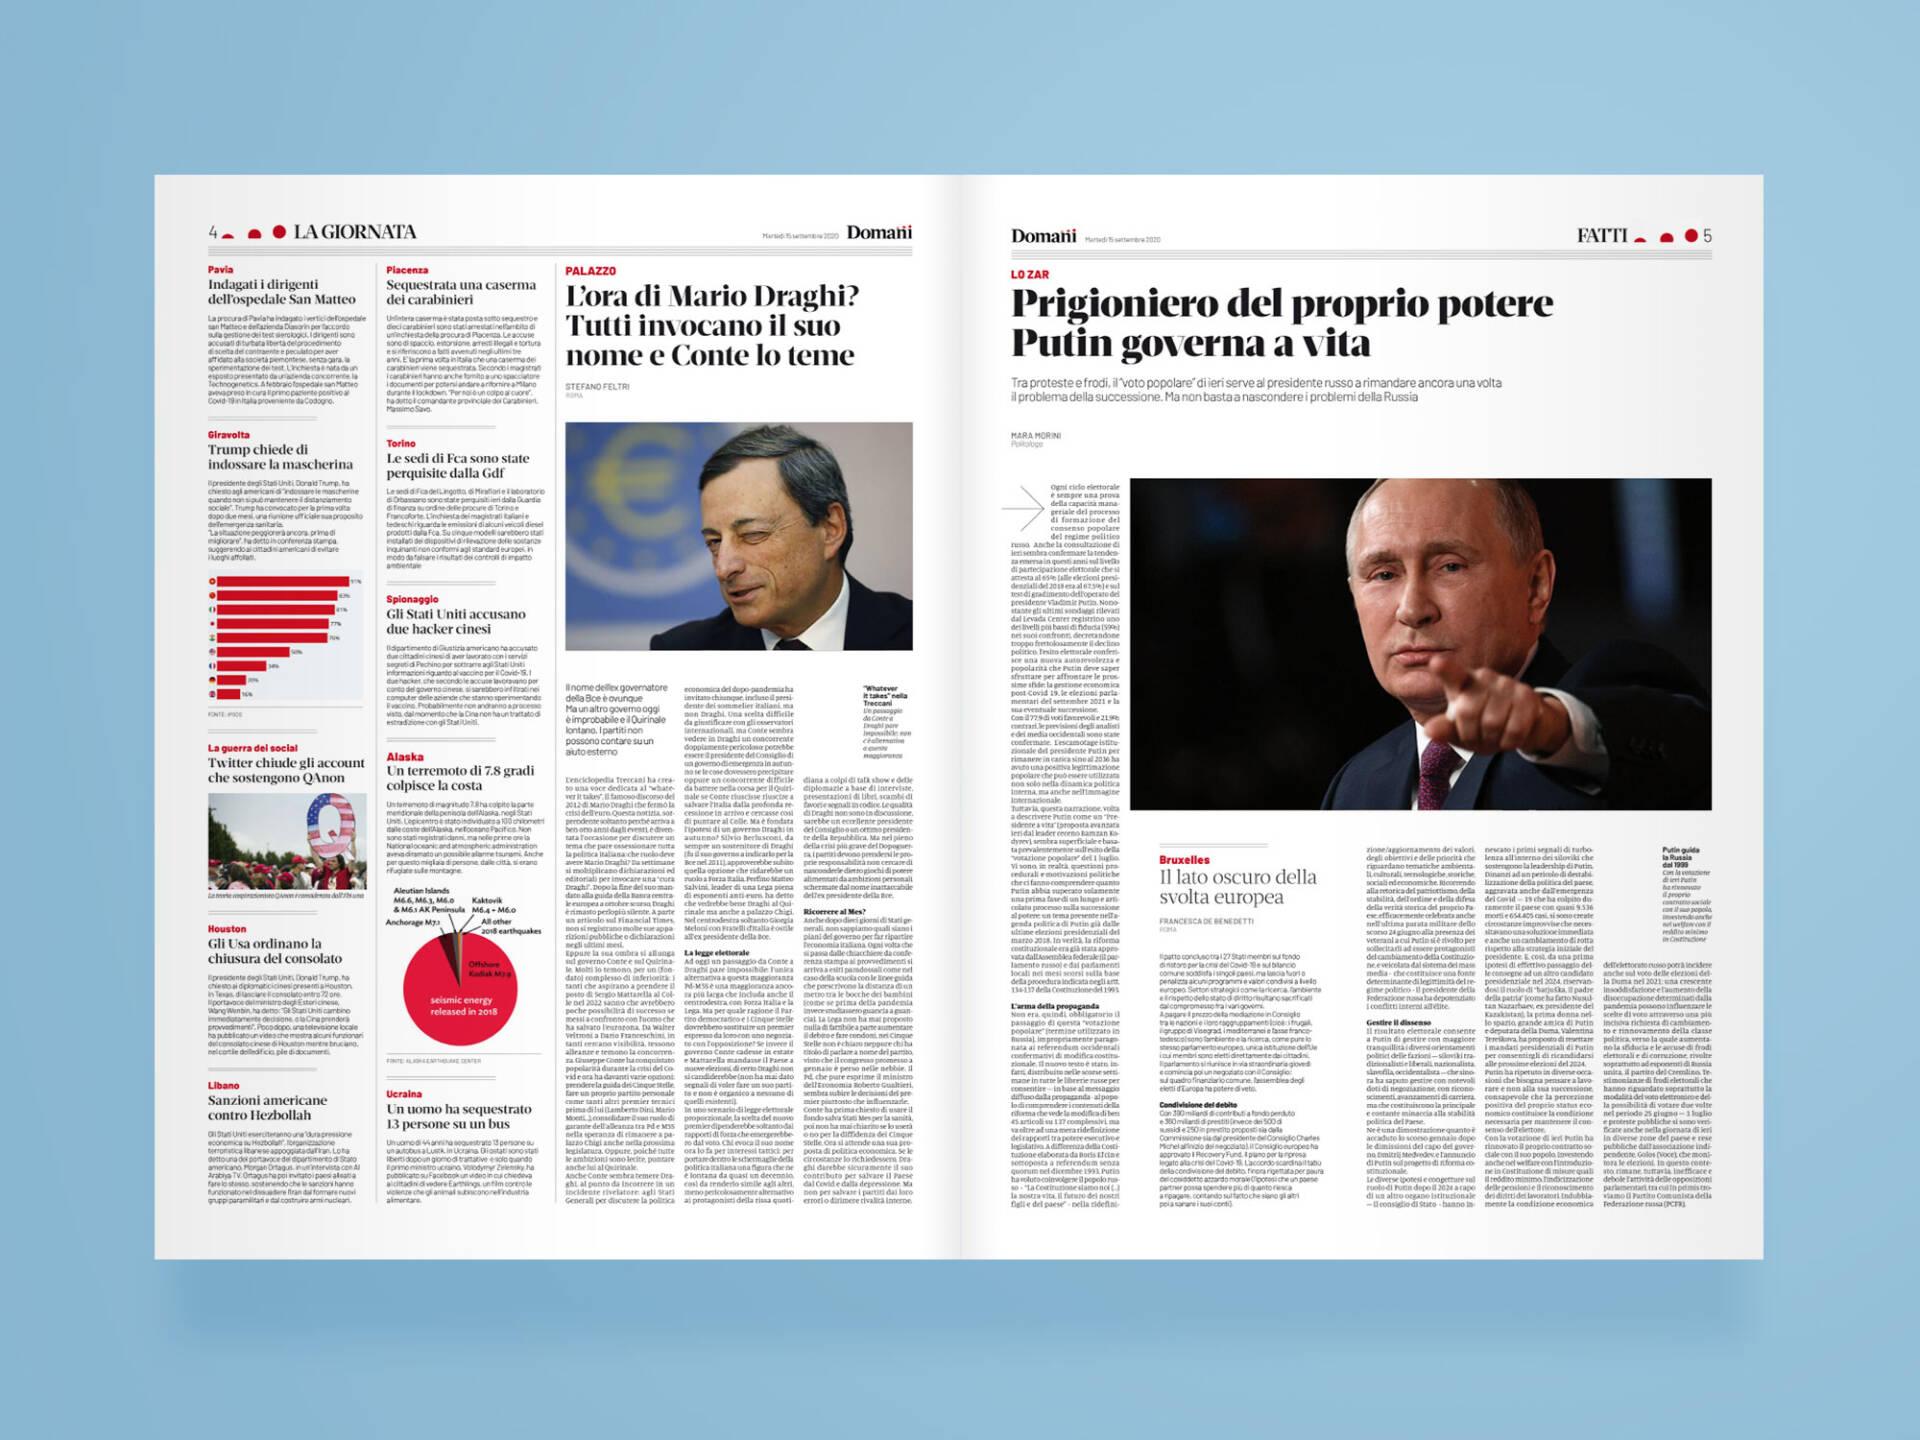 Domani_Print_03_Wenceslau_News_Design